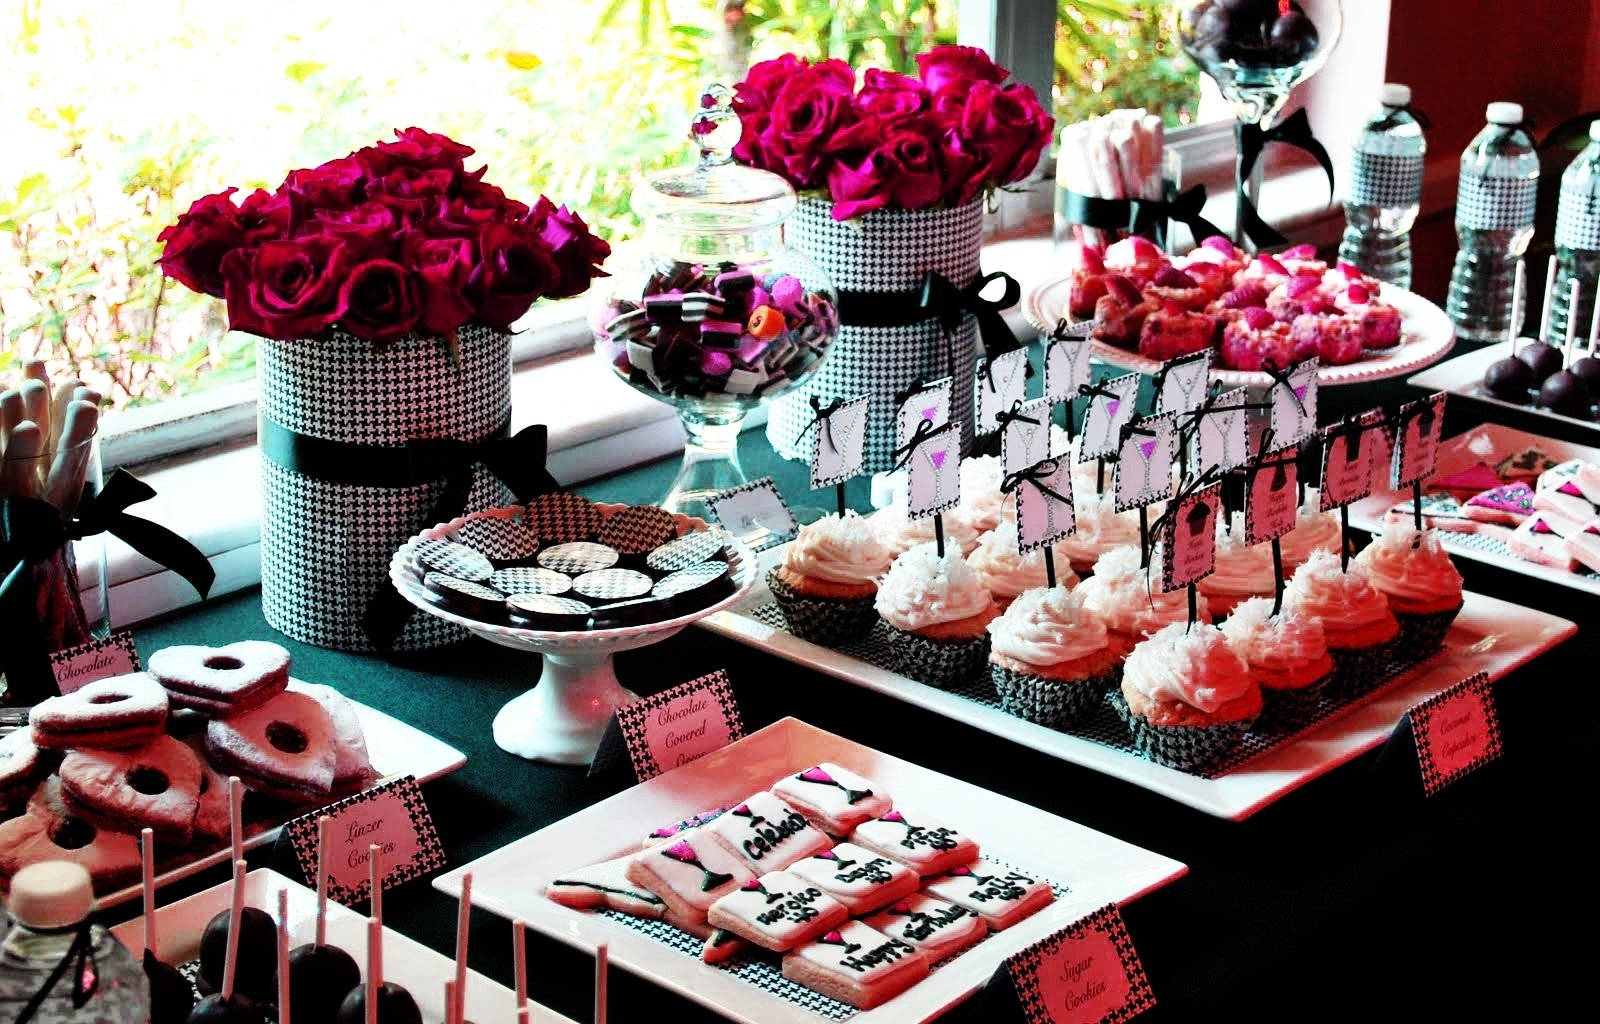 10 Stylish Fun Adult Birthday Party Ideas adult birthday party ideas adult birthday party ideas 2 1 2020